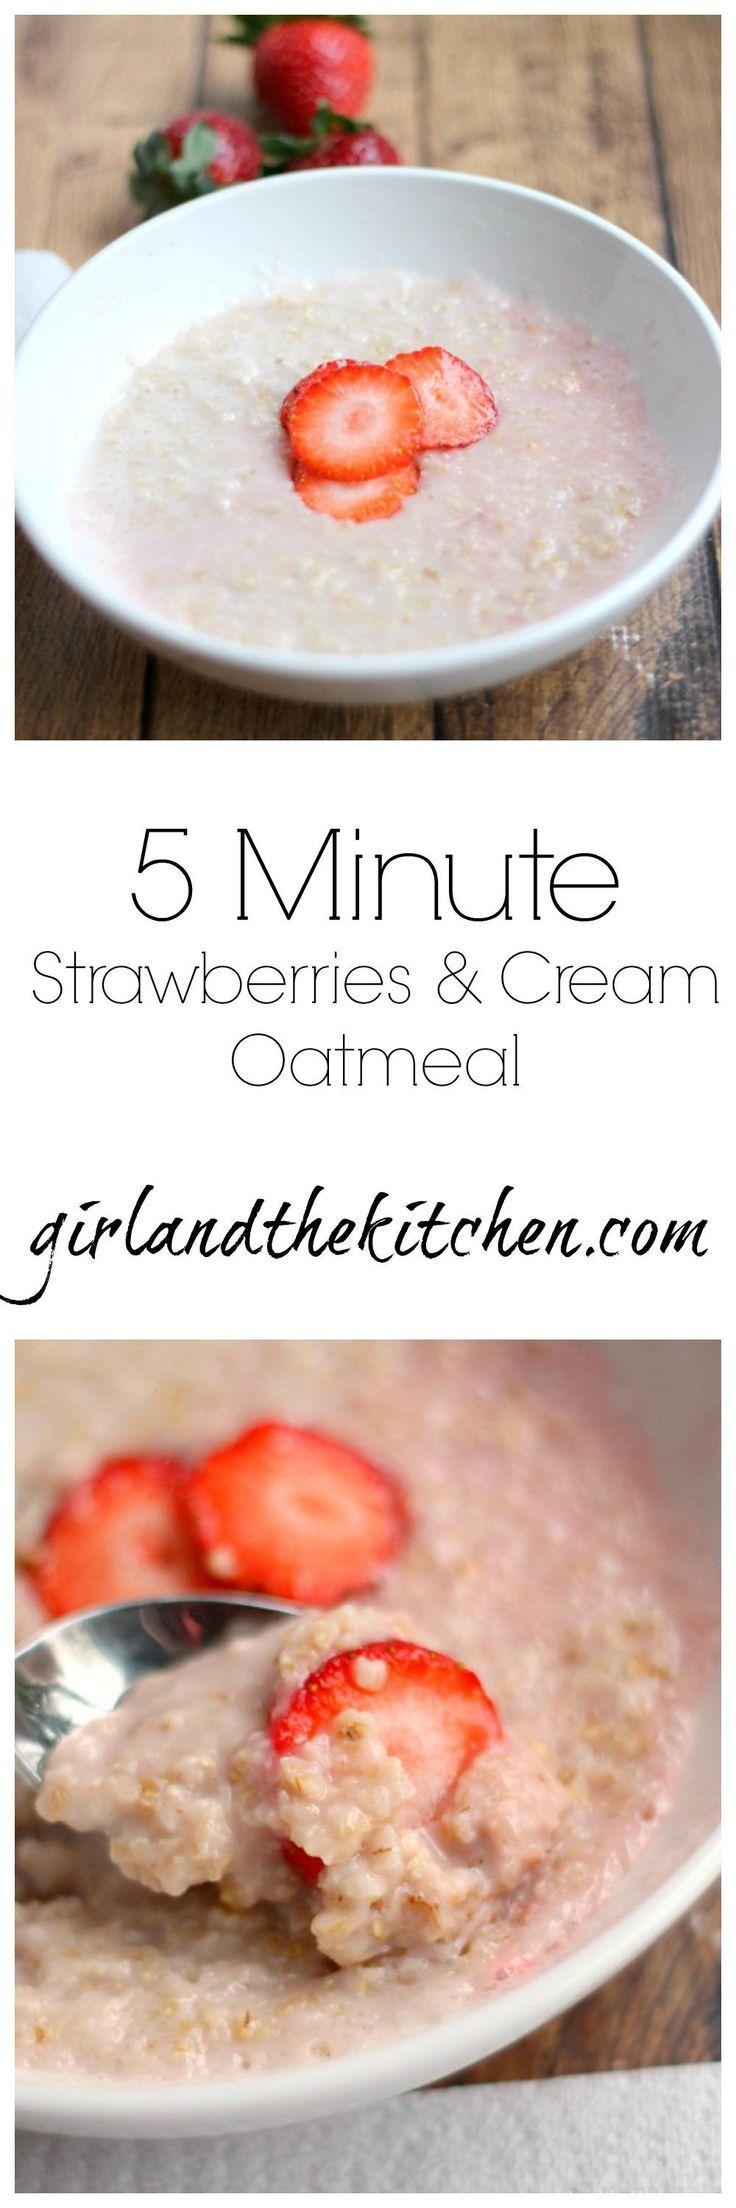 Strawberry and Cream Oatmeal. girlandthekitchen.com